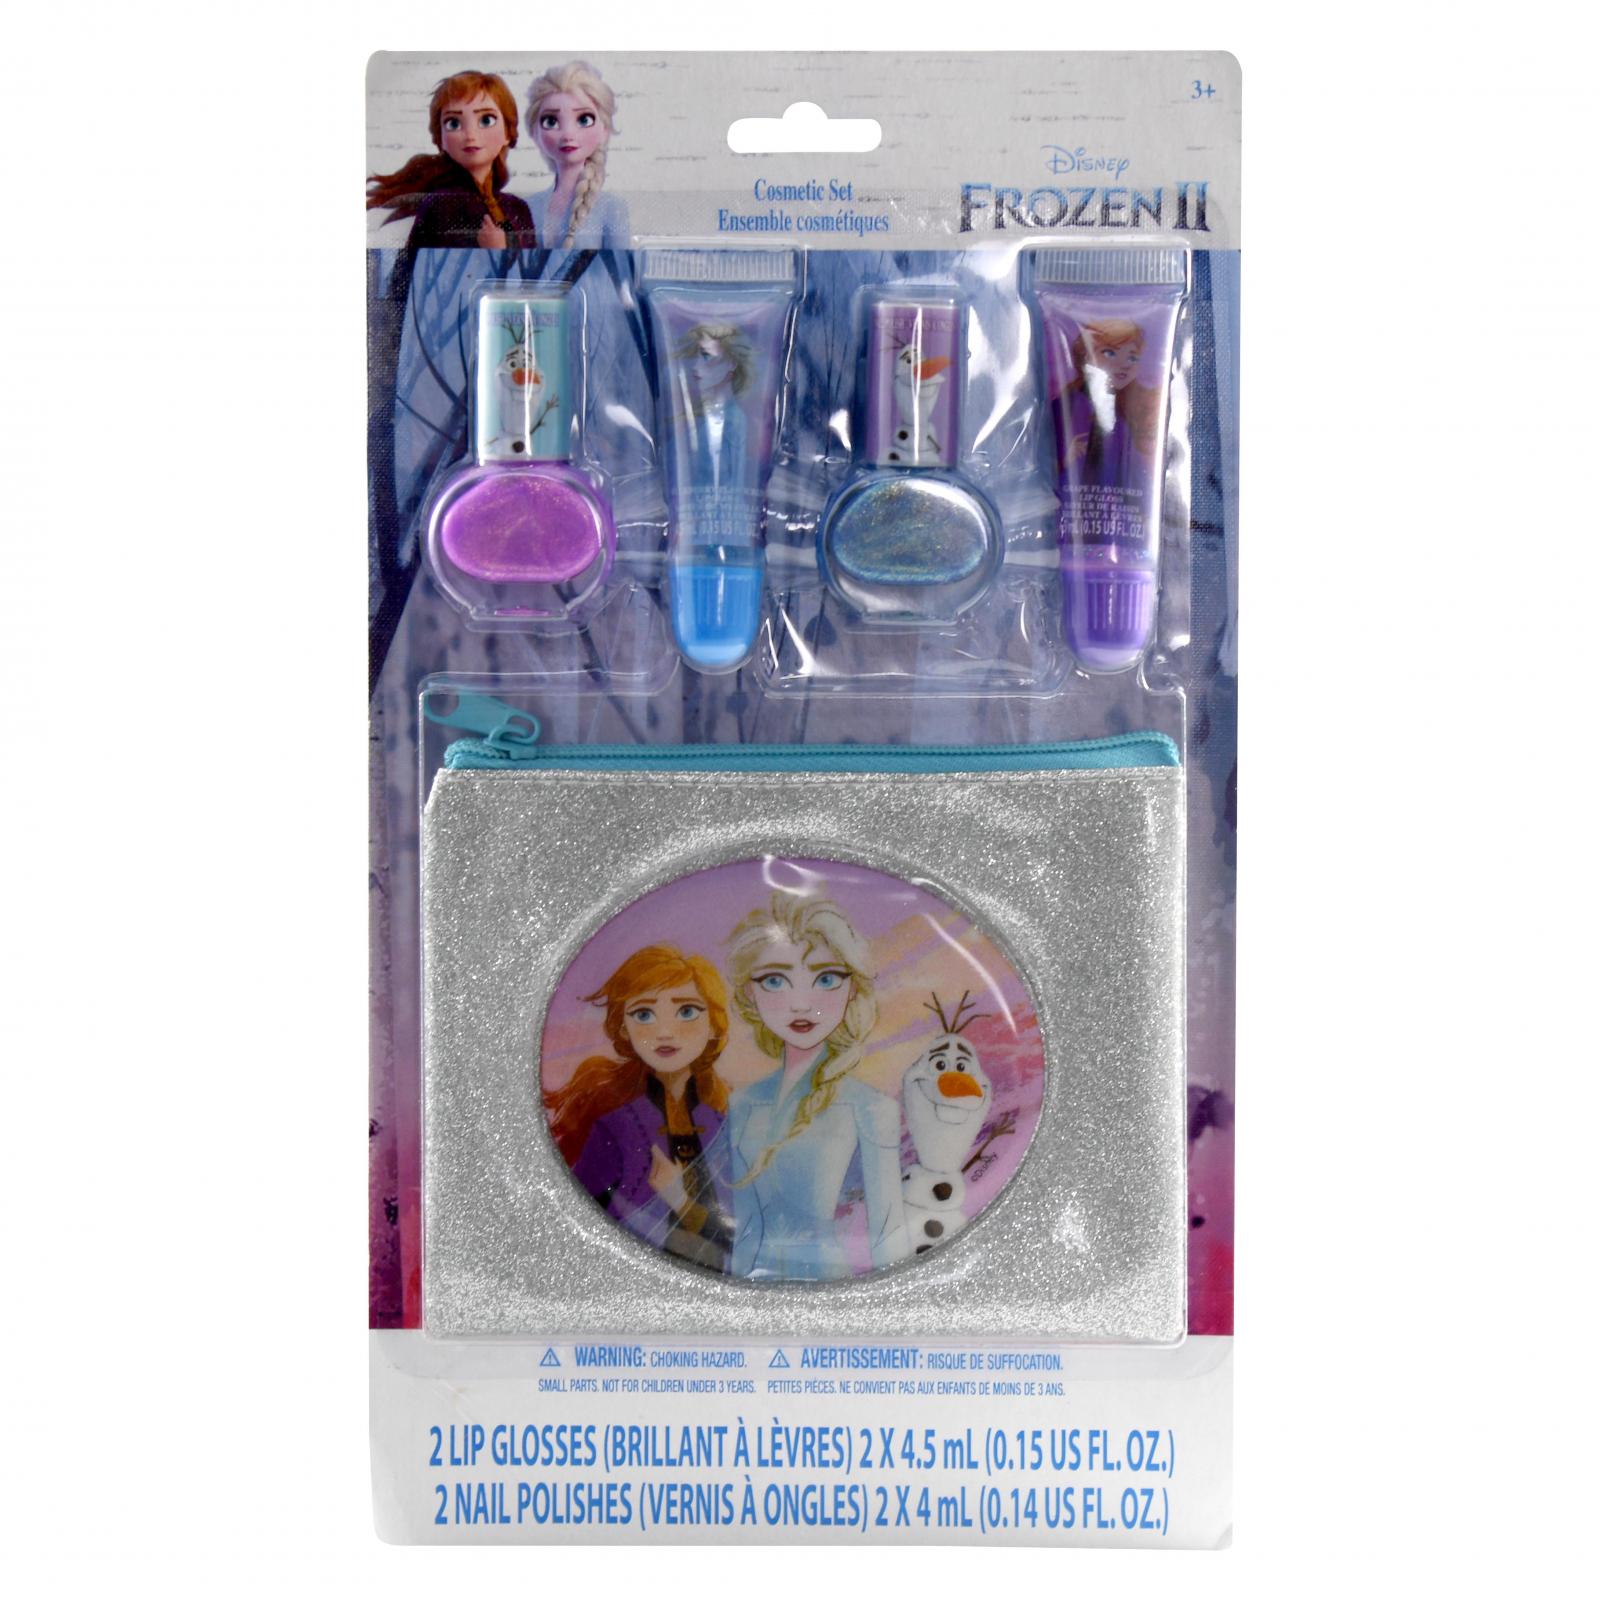 Disney Frozen 2 Girls Cosmetics Beauty Gift Nail Polish